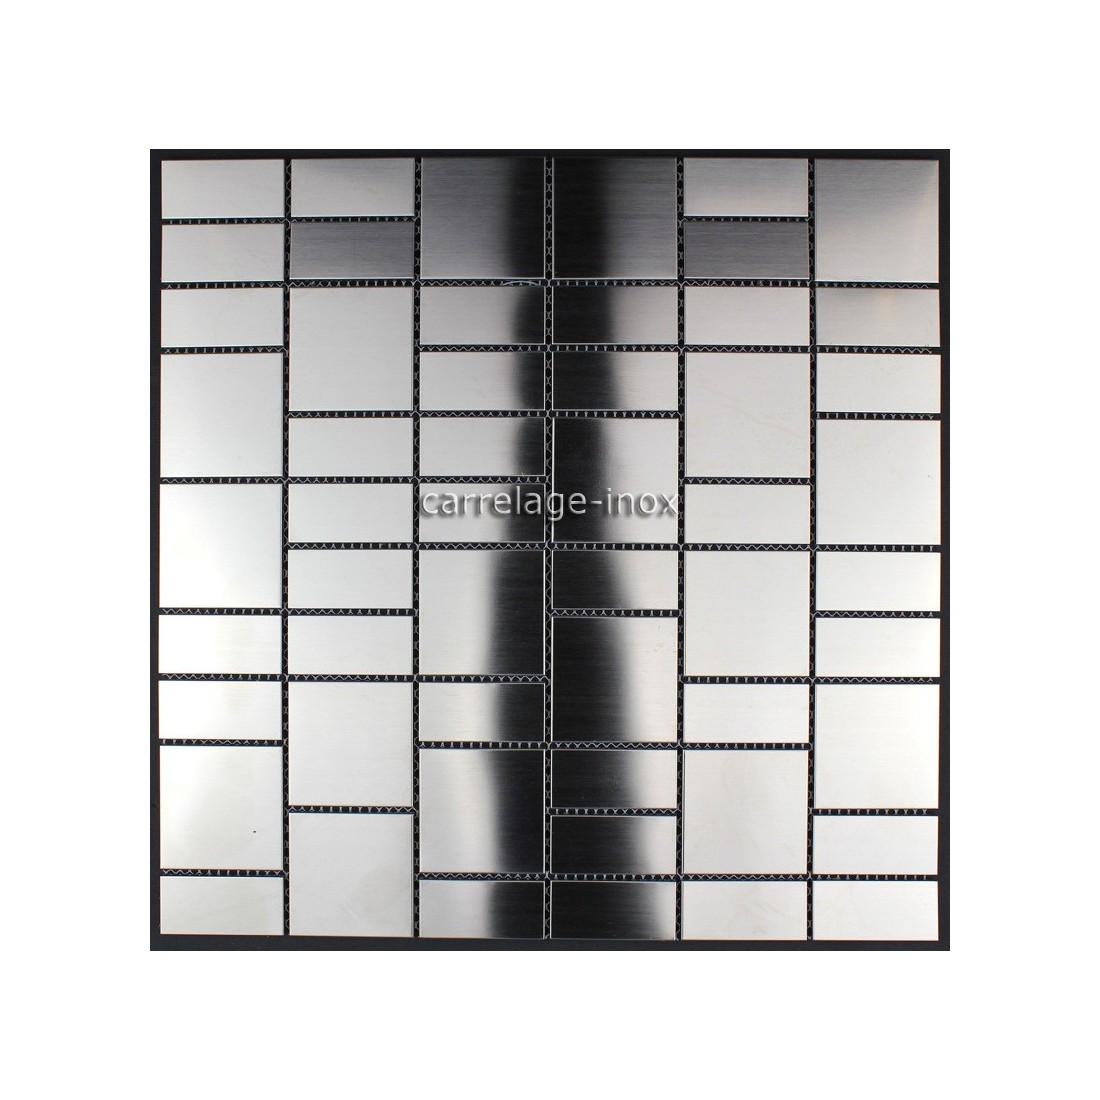 Mosaique inox brosse 1 m2 carrelage faience credence argos for Carrelage inox brosse